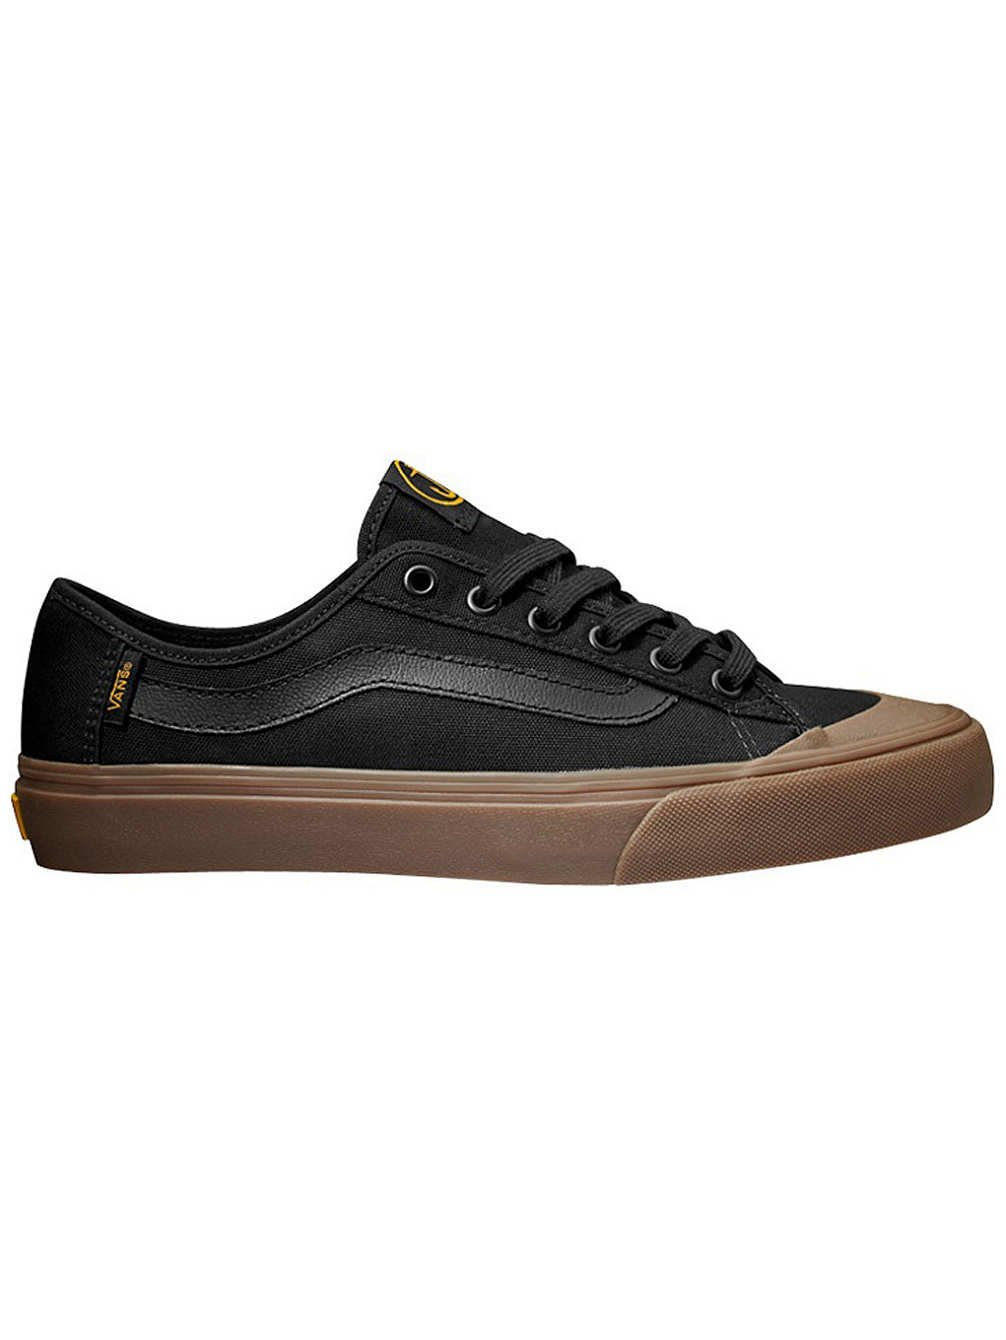 8a3845e241 Galleon - Vans Black Ball SF Captain Fin Black Gum Mens Shoes Mens  7.5 Womens 9